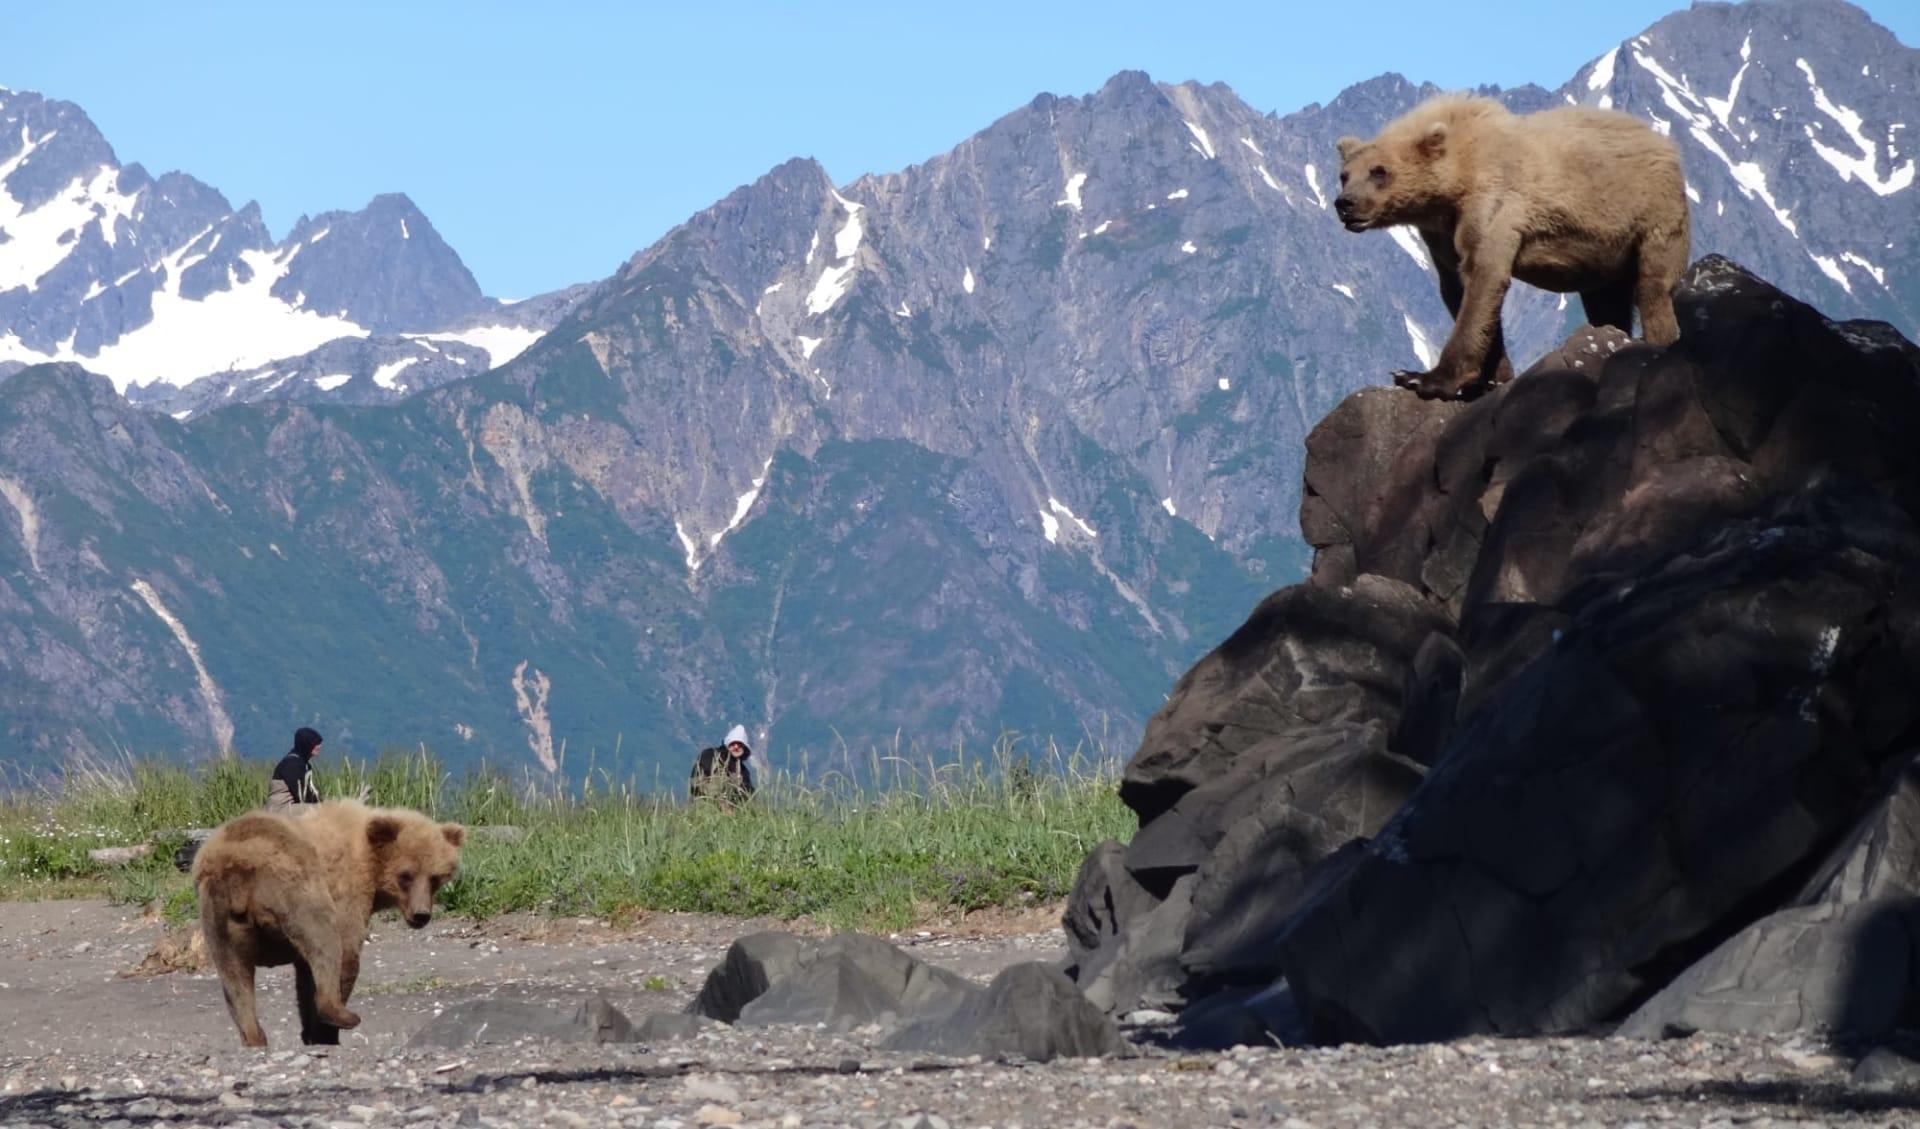 Bärenbeobachtung Great Alaska Bear Camp ab Anchorage: activities: Great Alaska Bear Camp_Bears (4)